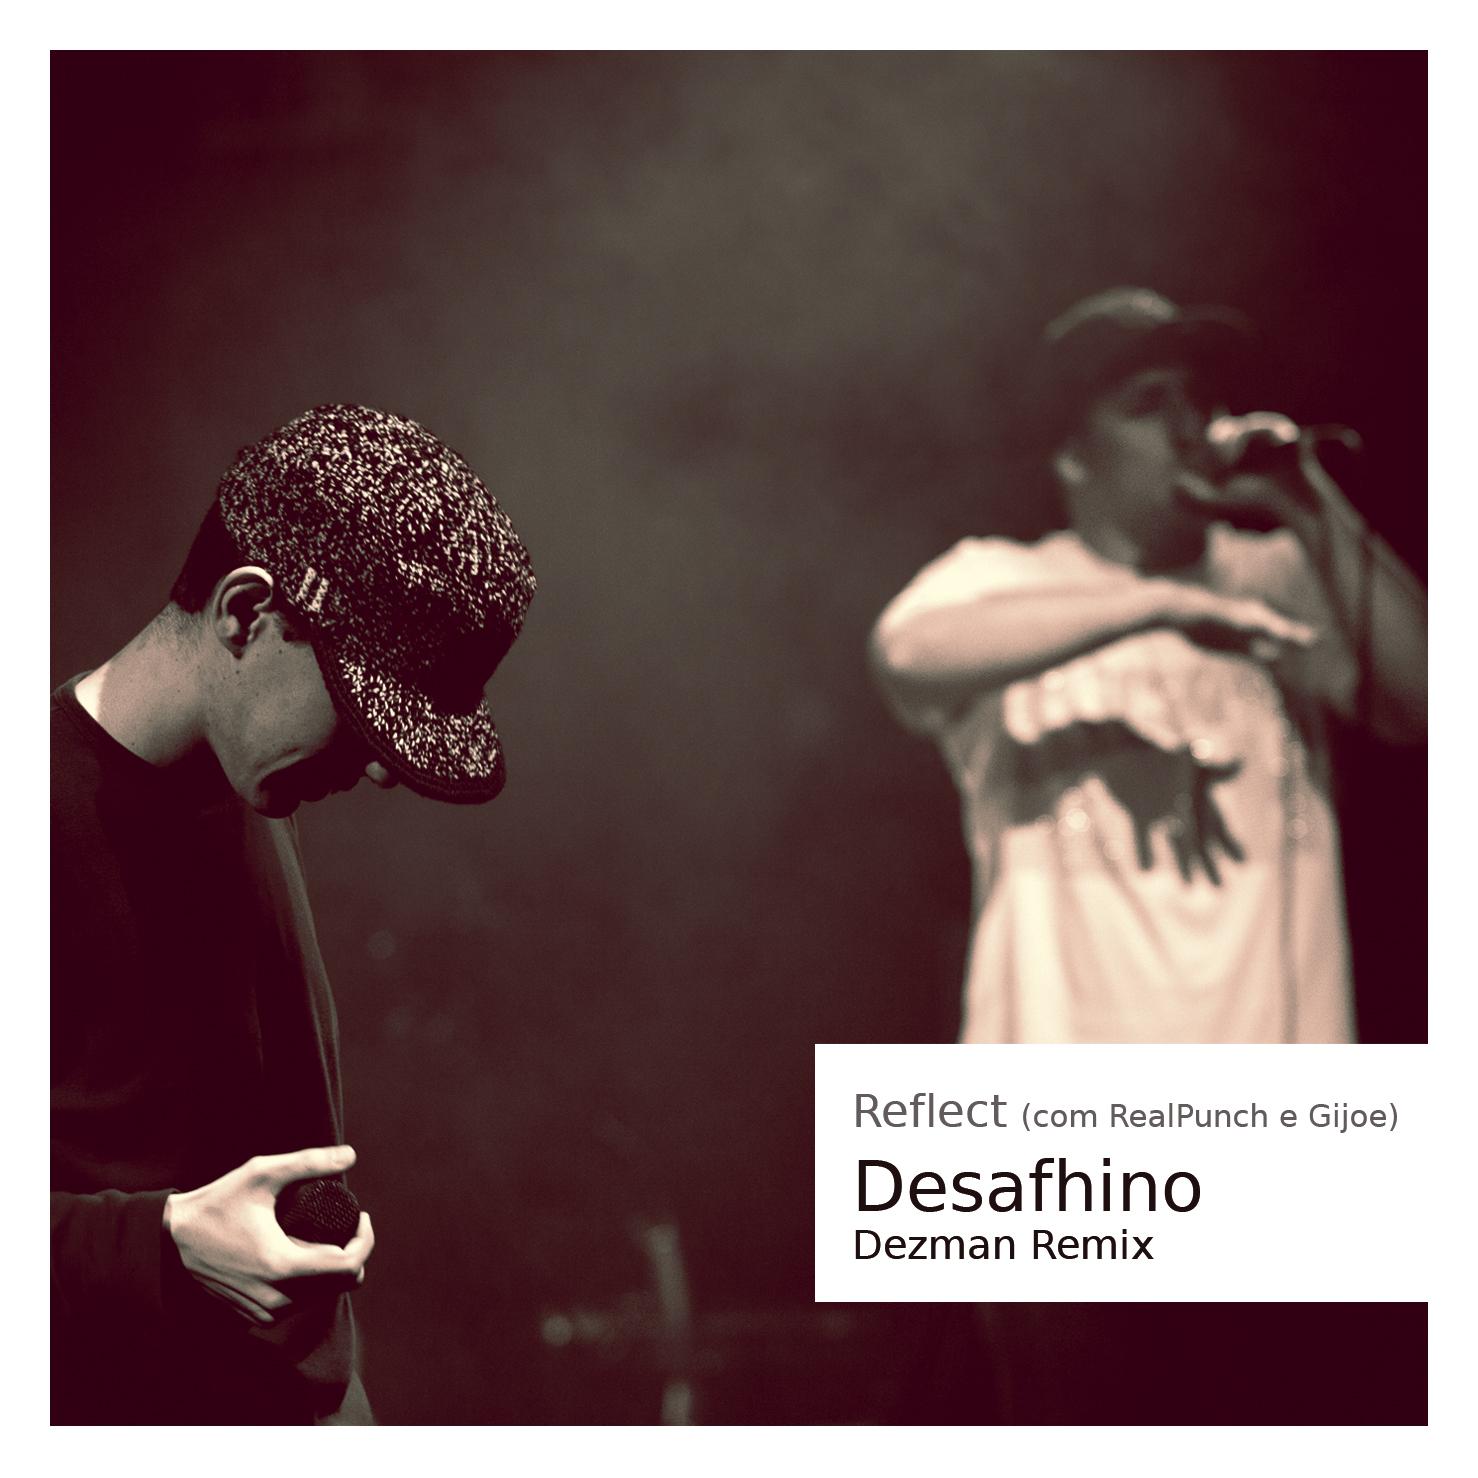 Reflect - Desafhino (com RealPunch e Gijoe) [Dezman Remix]